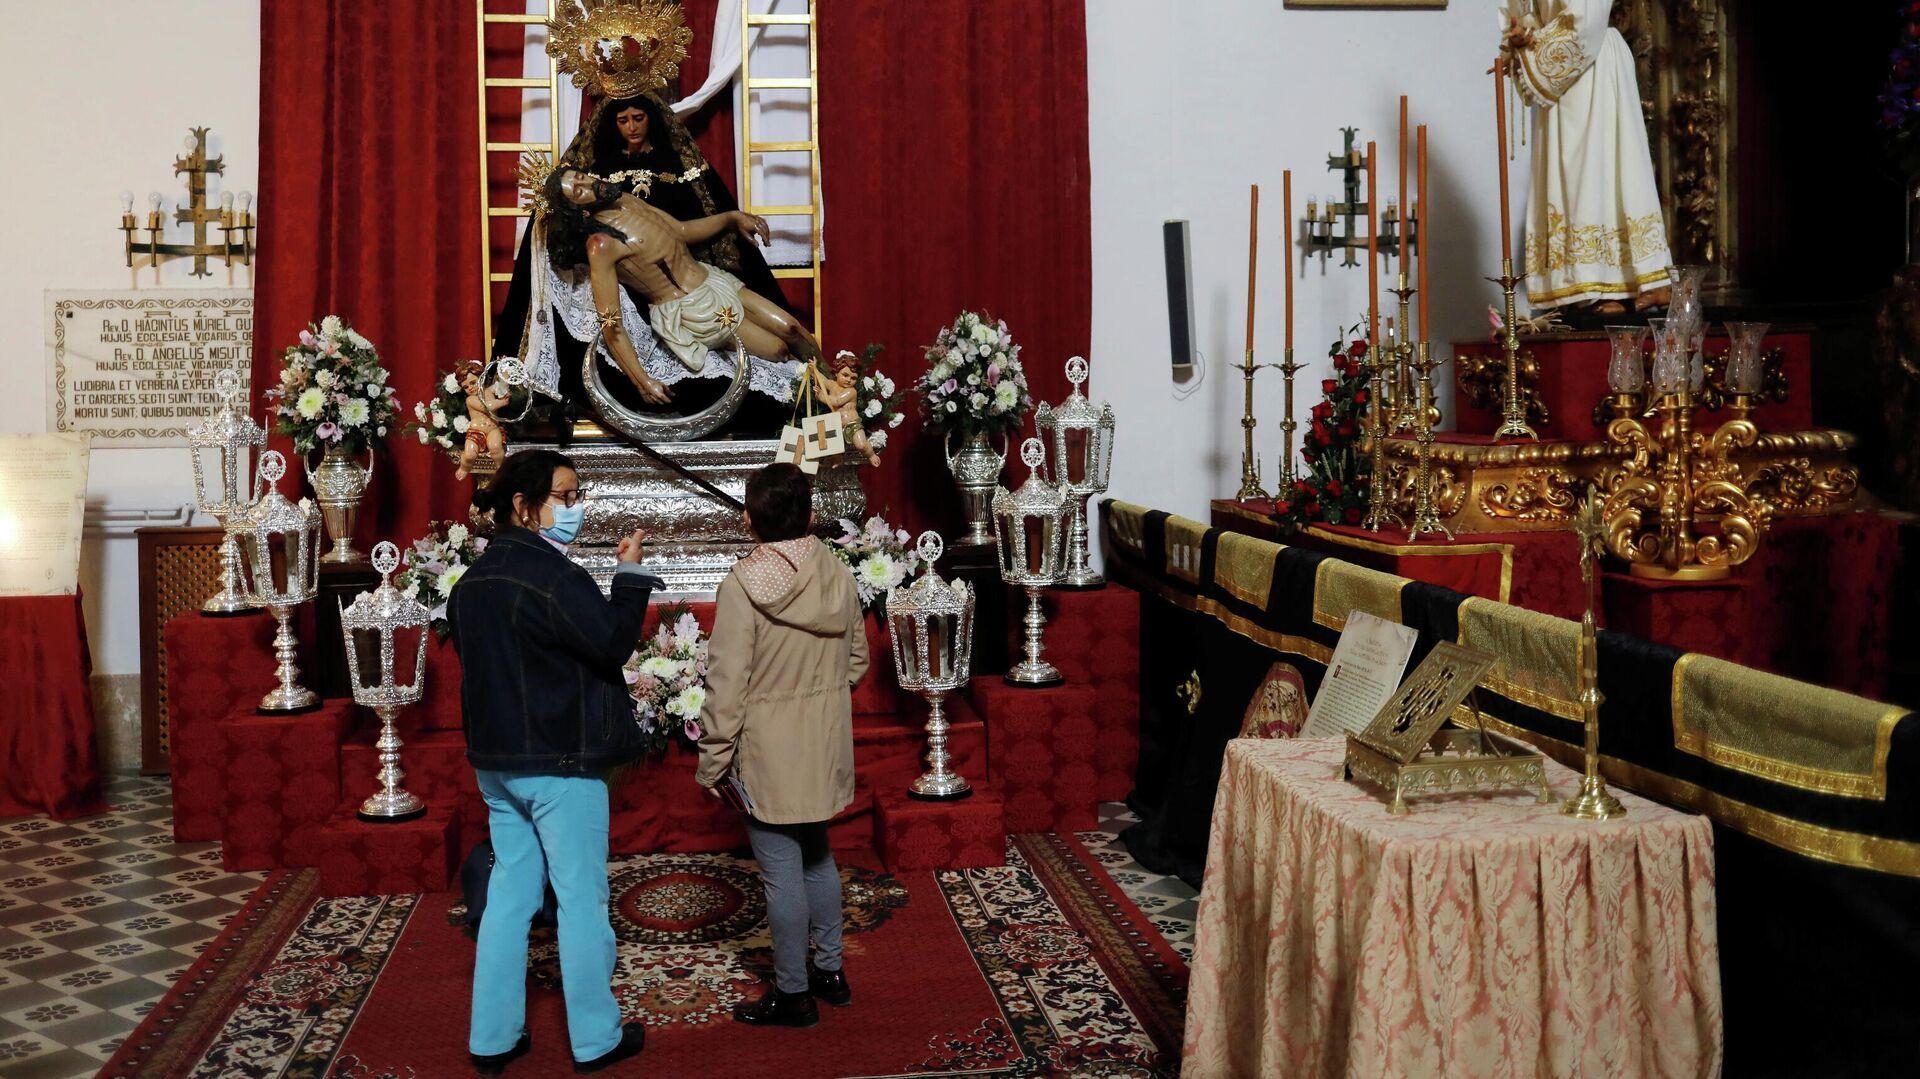 Españoles en una iglesia - Sputnik Mundo, 1920, 31.03.2021